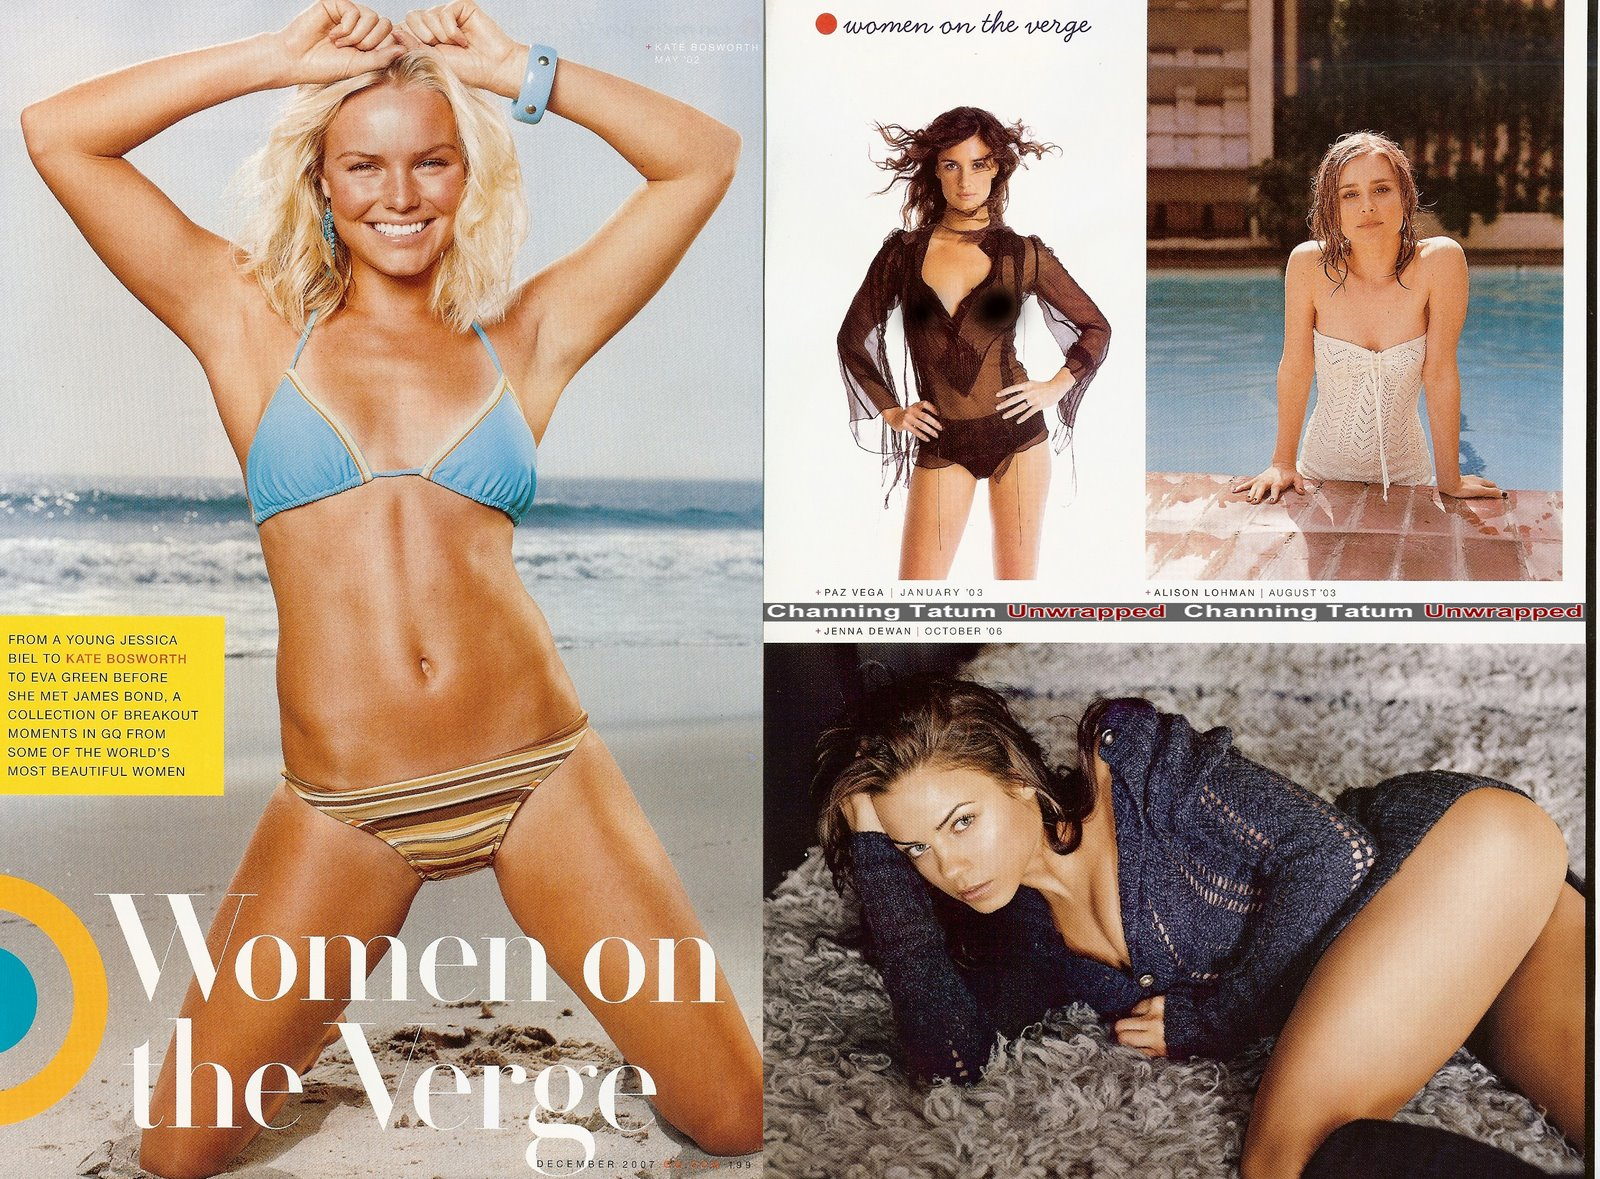 http://3.bp.blogspot.com/_5kPZ5em3LCI/R1MkK1Dyq7I/AAAAAAAADSs/aPRGDGZ4tJg/s1600-R/Jenna-Dewan-GQ-Magazine-December-2007-Article.jpg